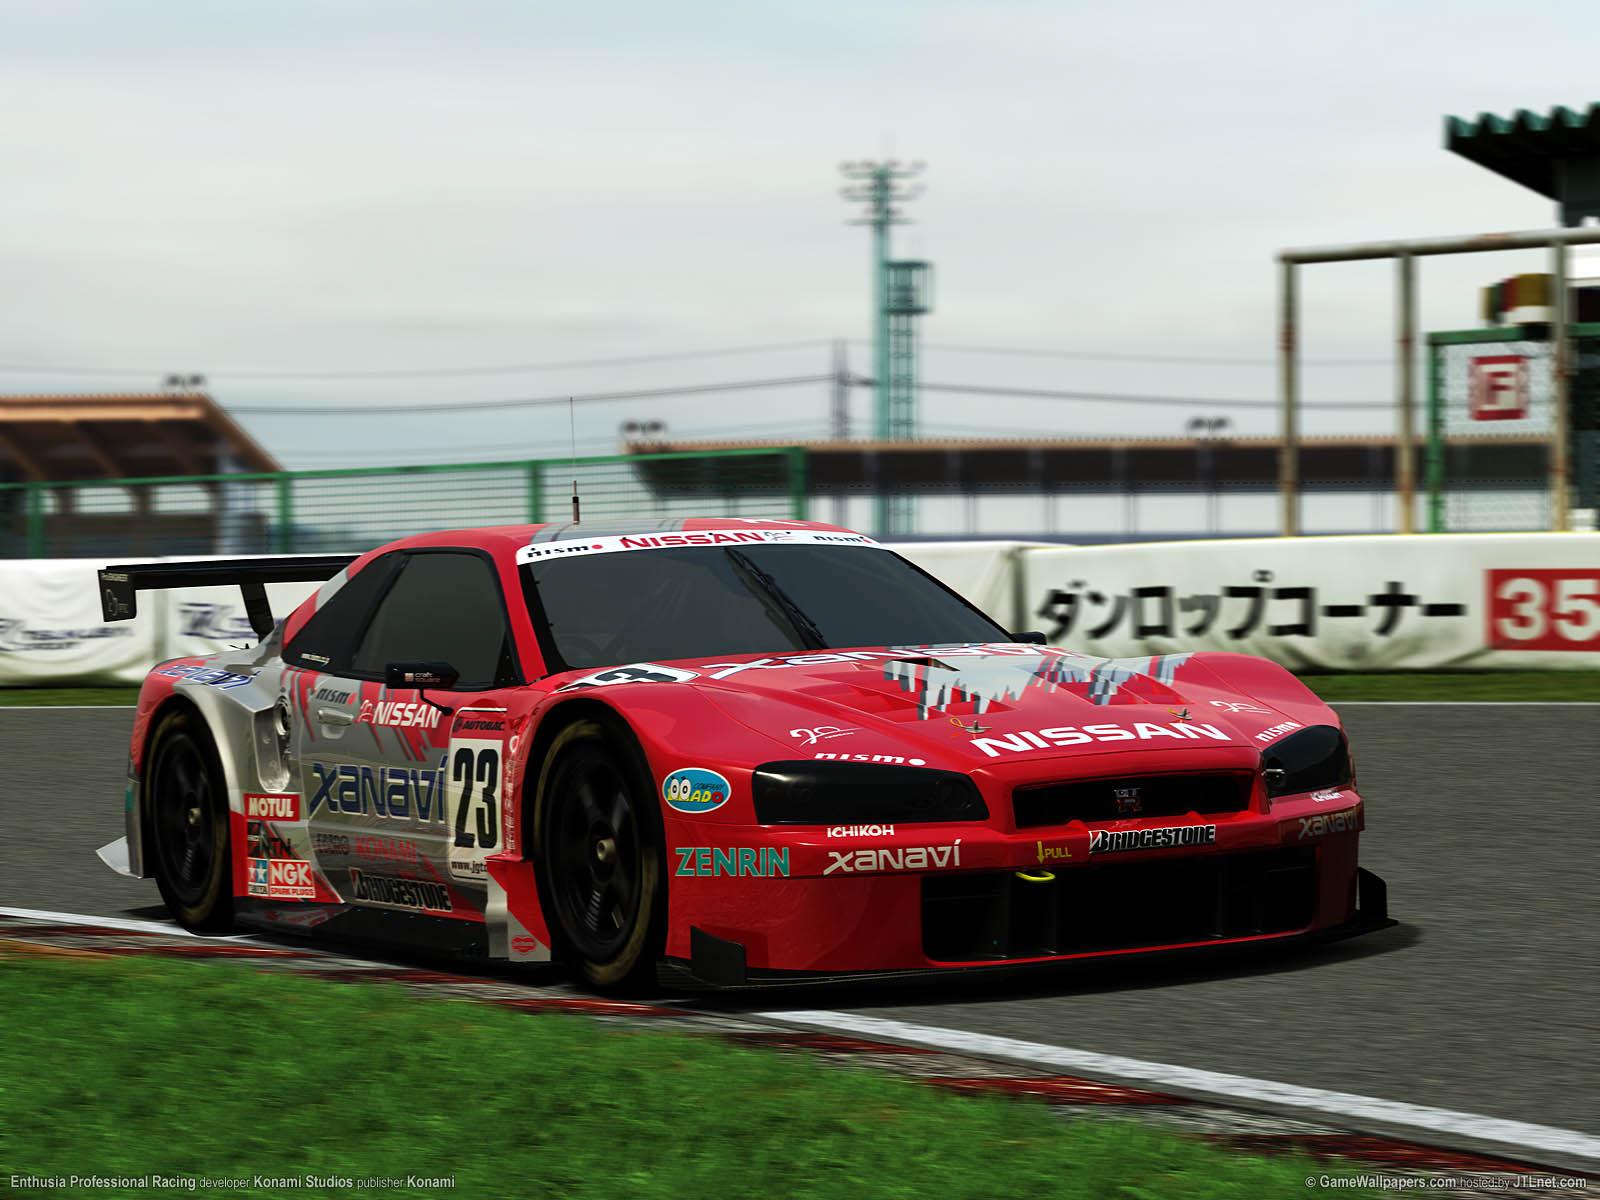 Enthusia Professional Racing Hintergrundbild 02 1600x1200